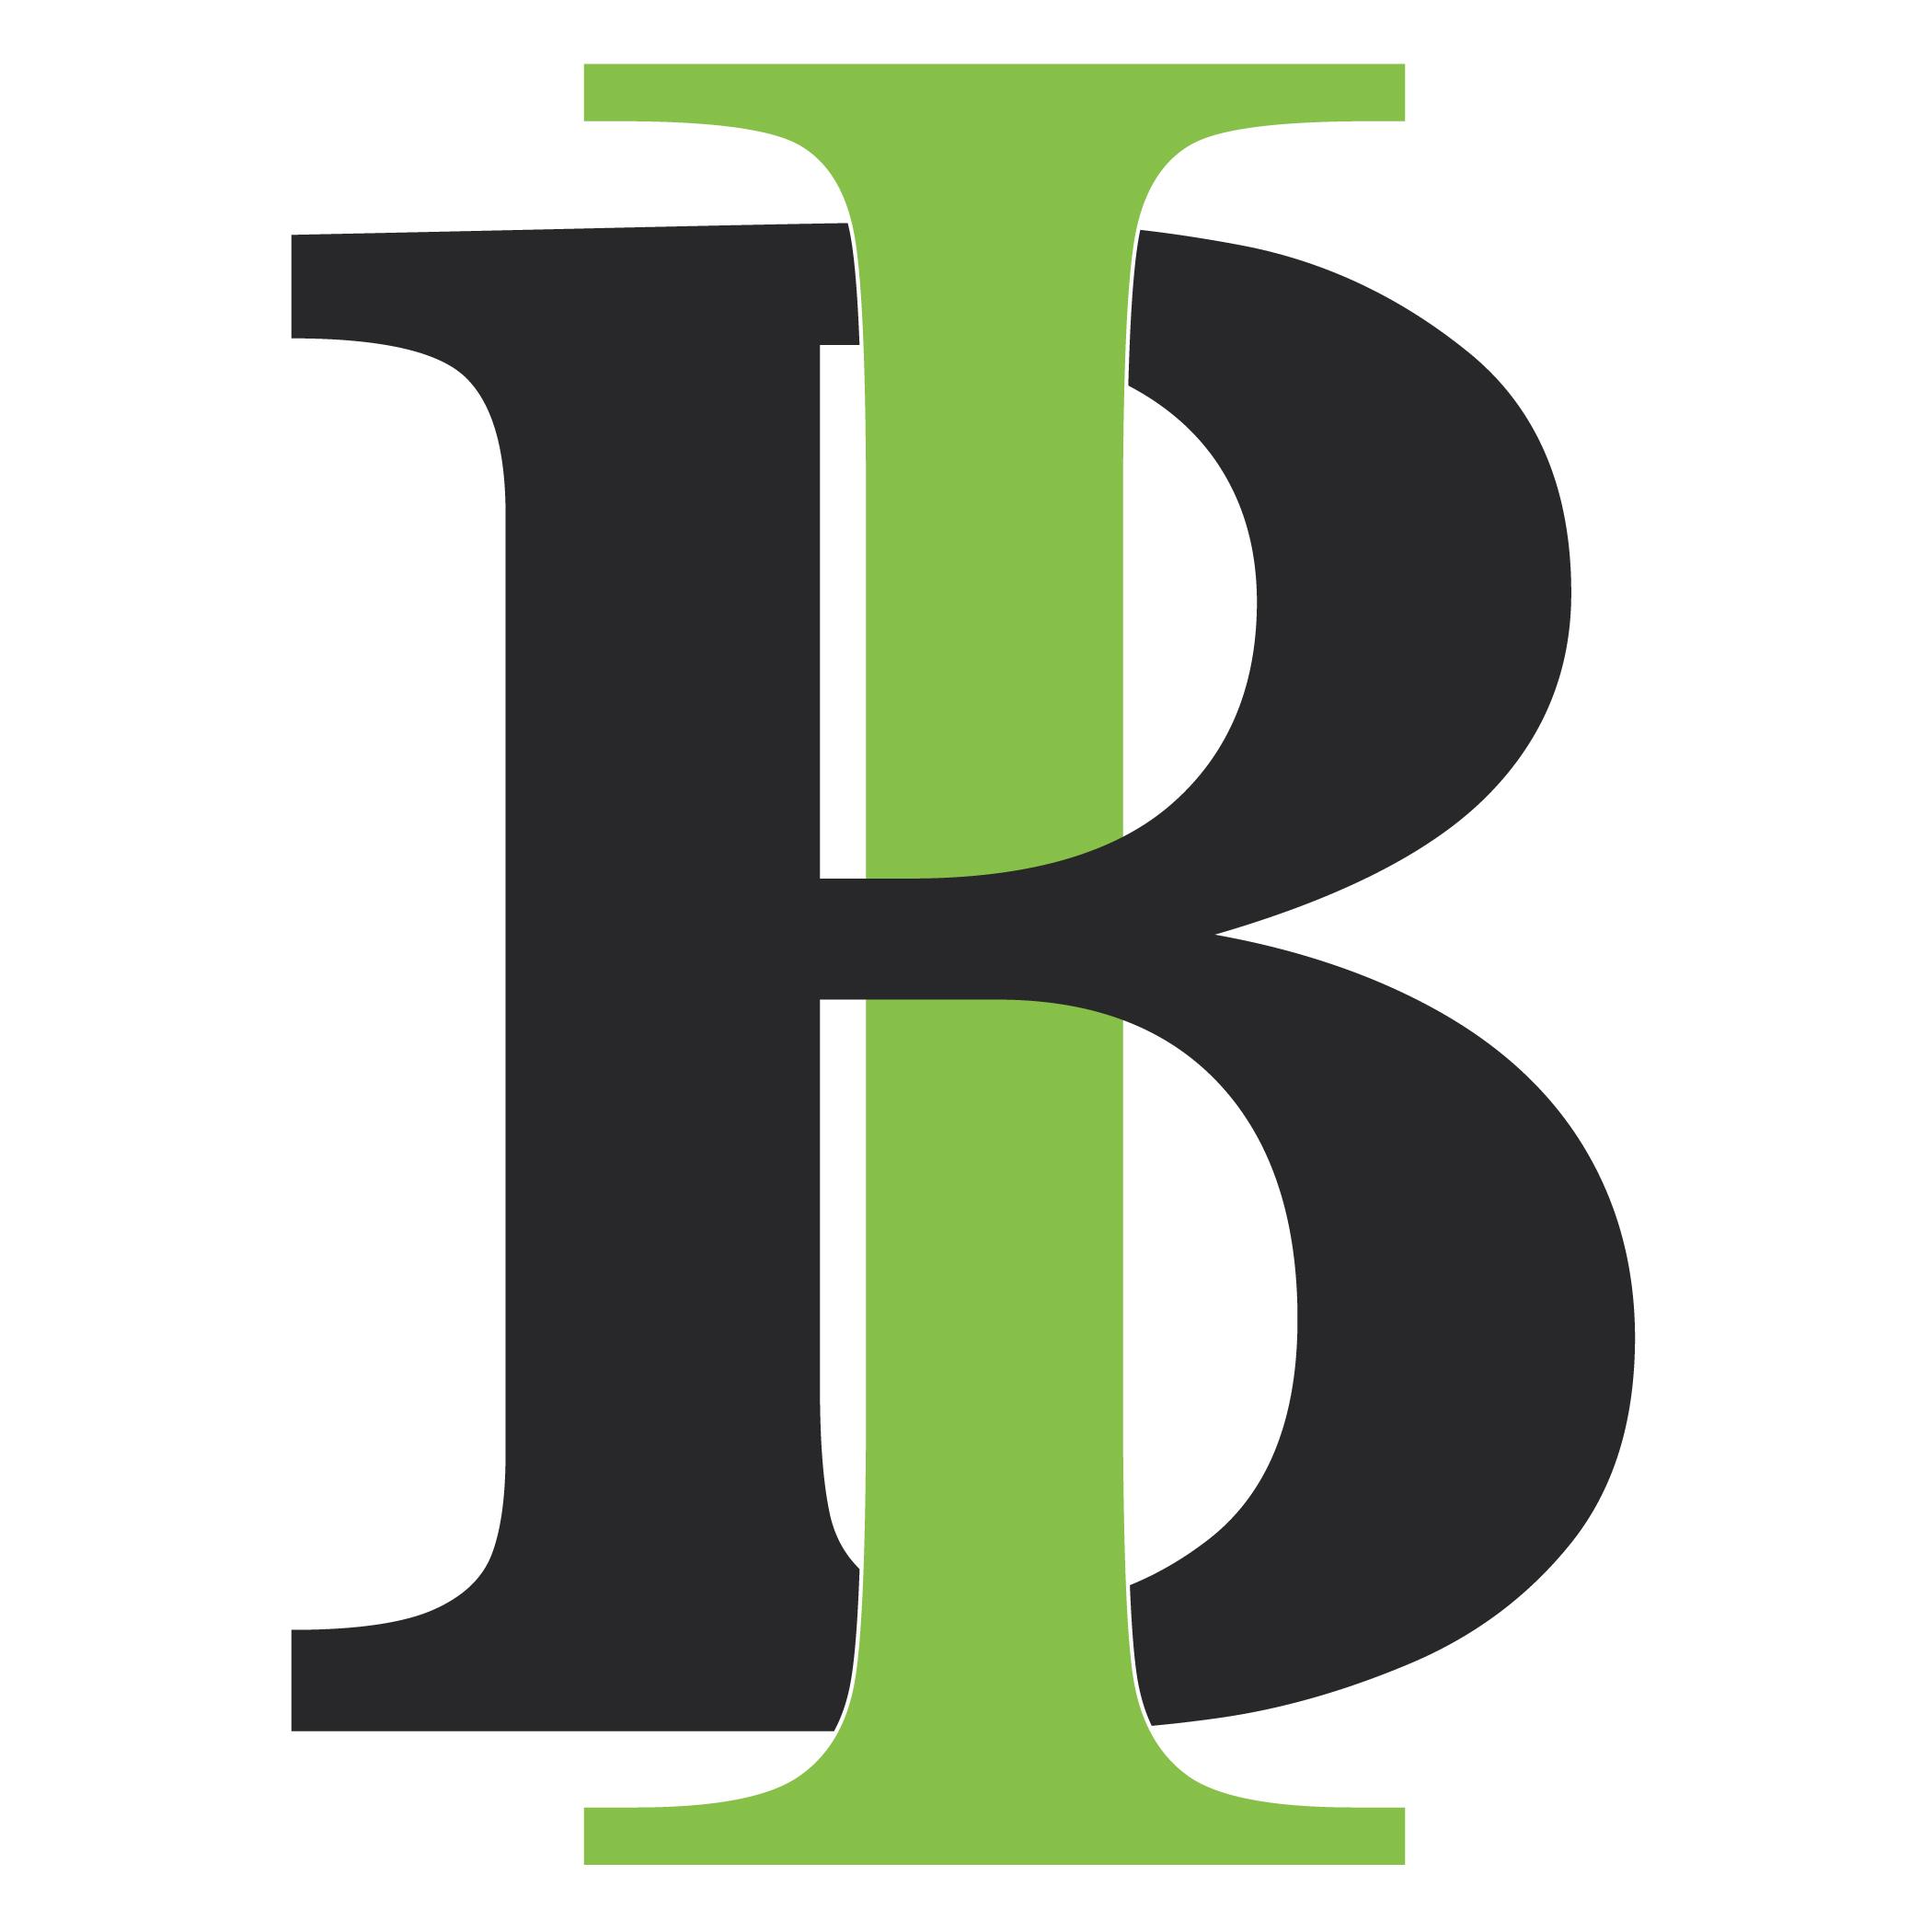 Brantley Industries Llc